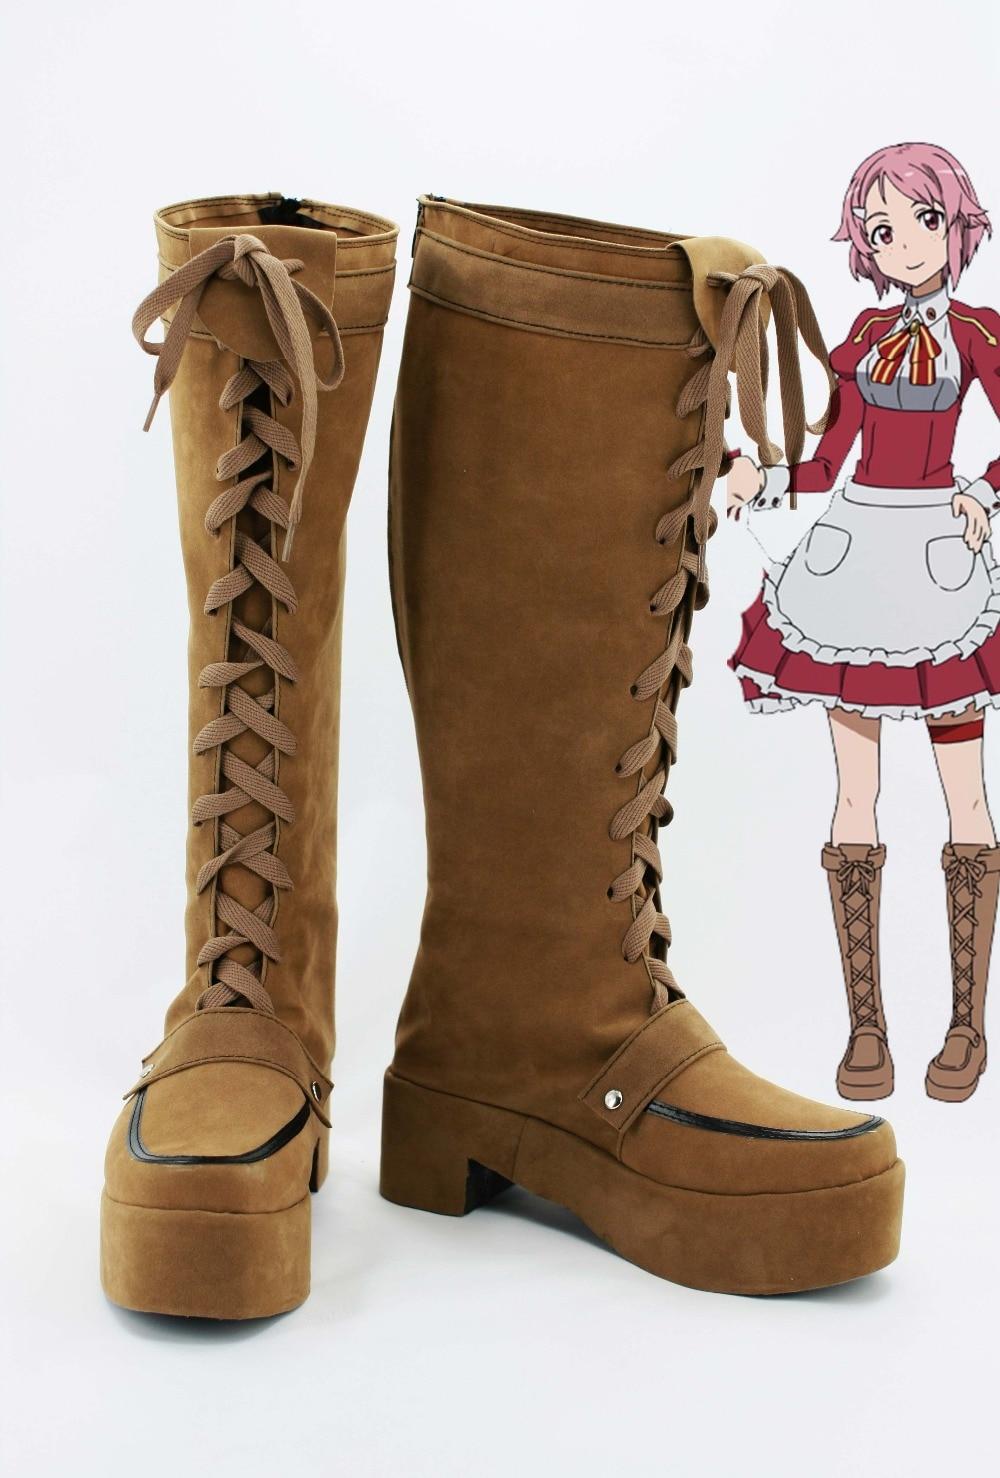 Sword Art Online Lisbeth Rika Shinozaki Cosplay Costume Shoes Boots Custom Made EU/European Size